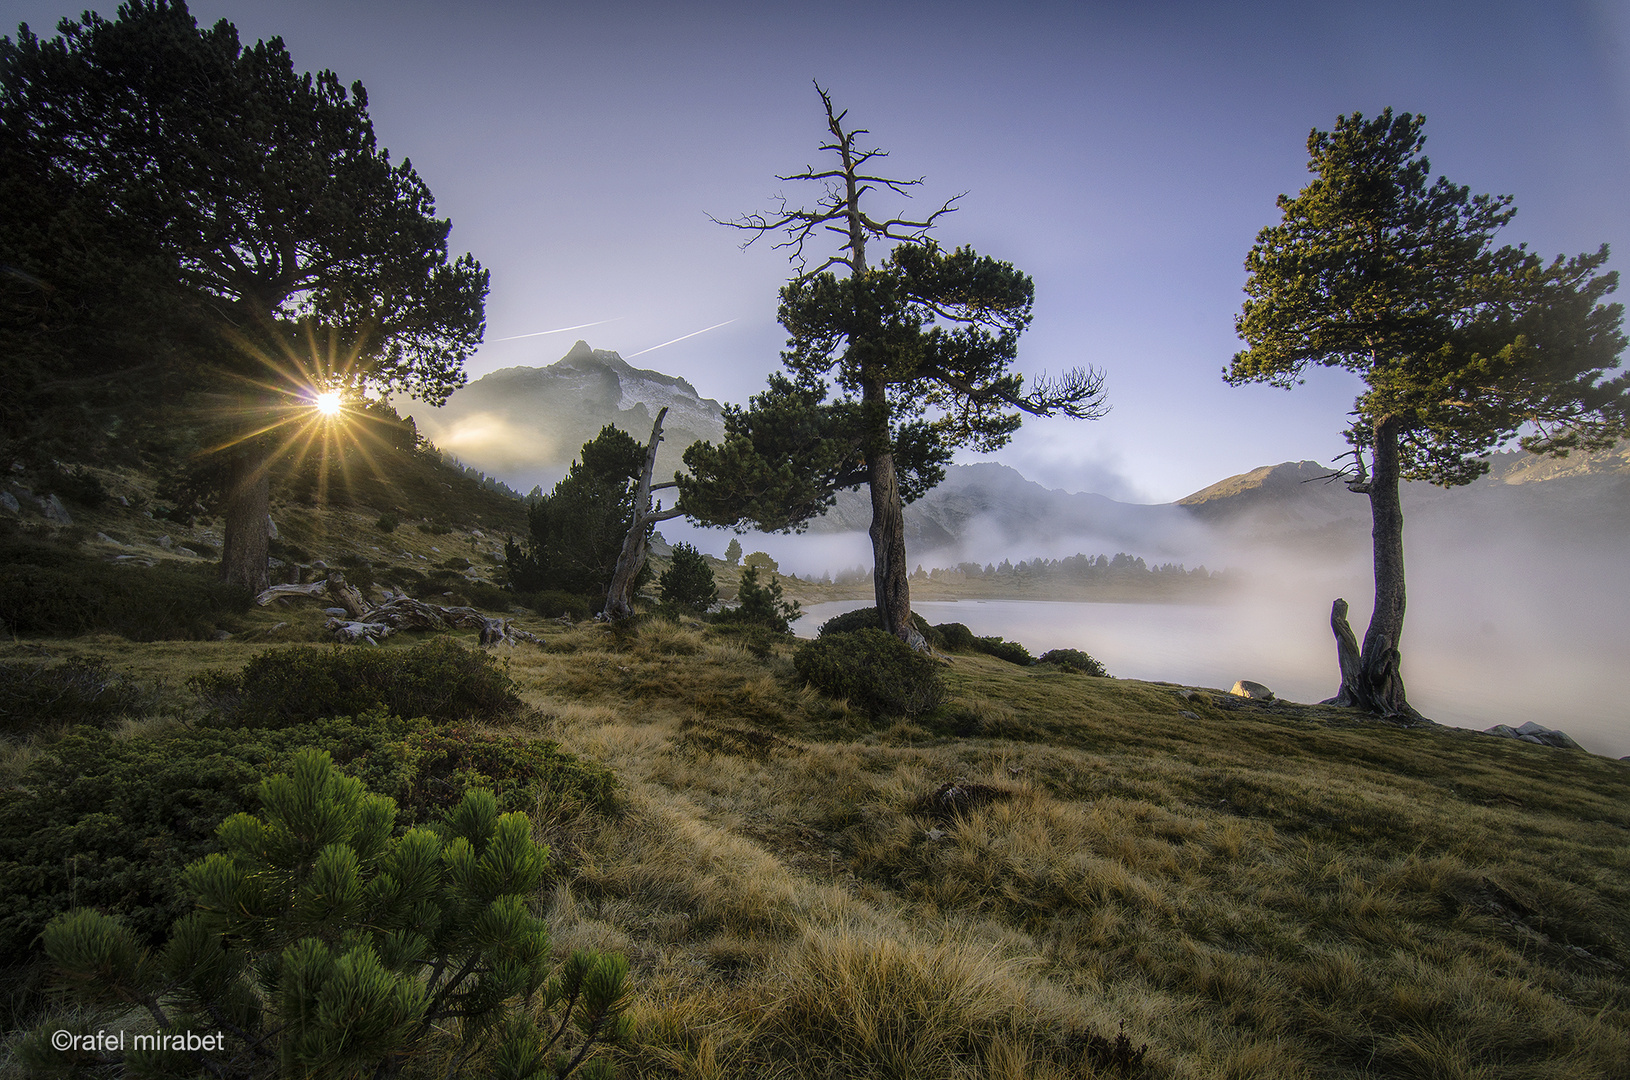 Camino a la luz, (way to the light)